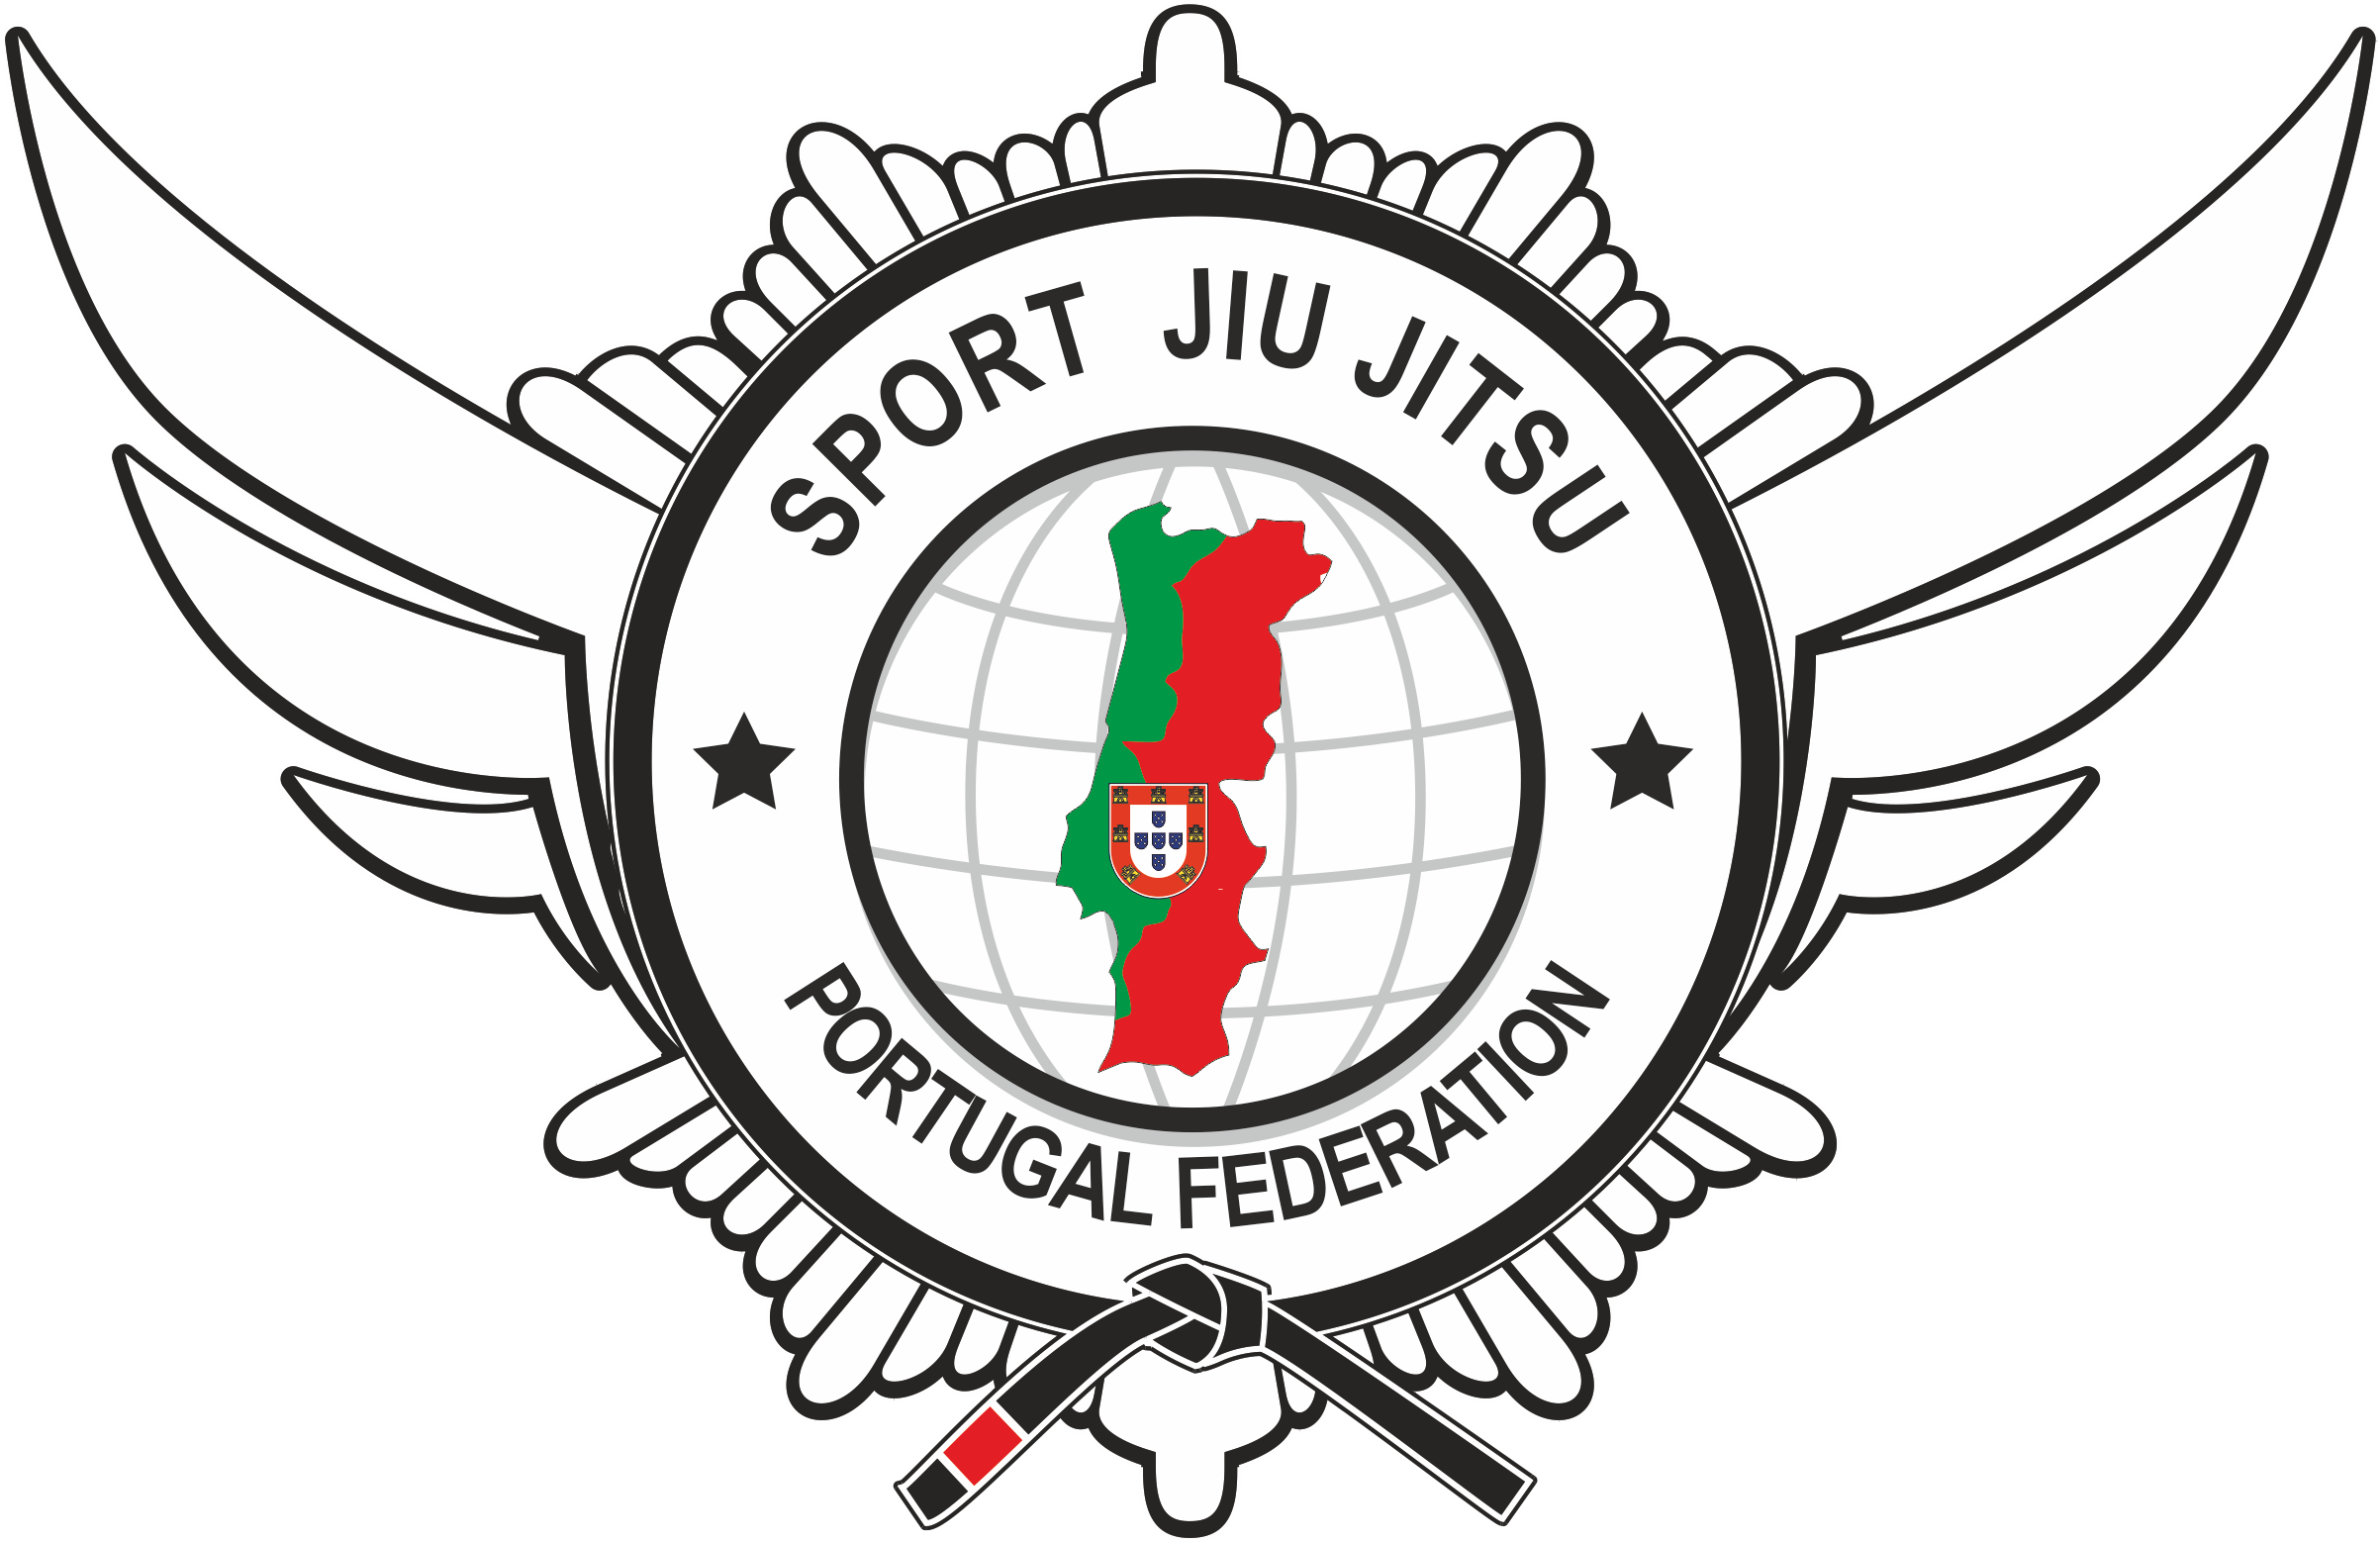 Sport Jiu Jitsu Portugal Federation